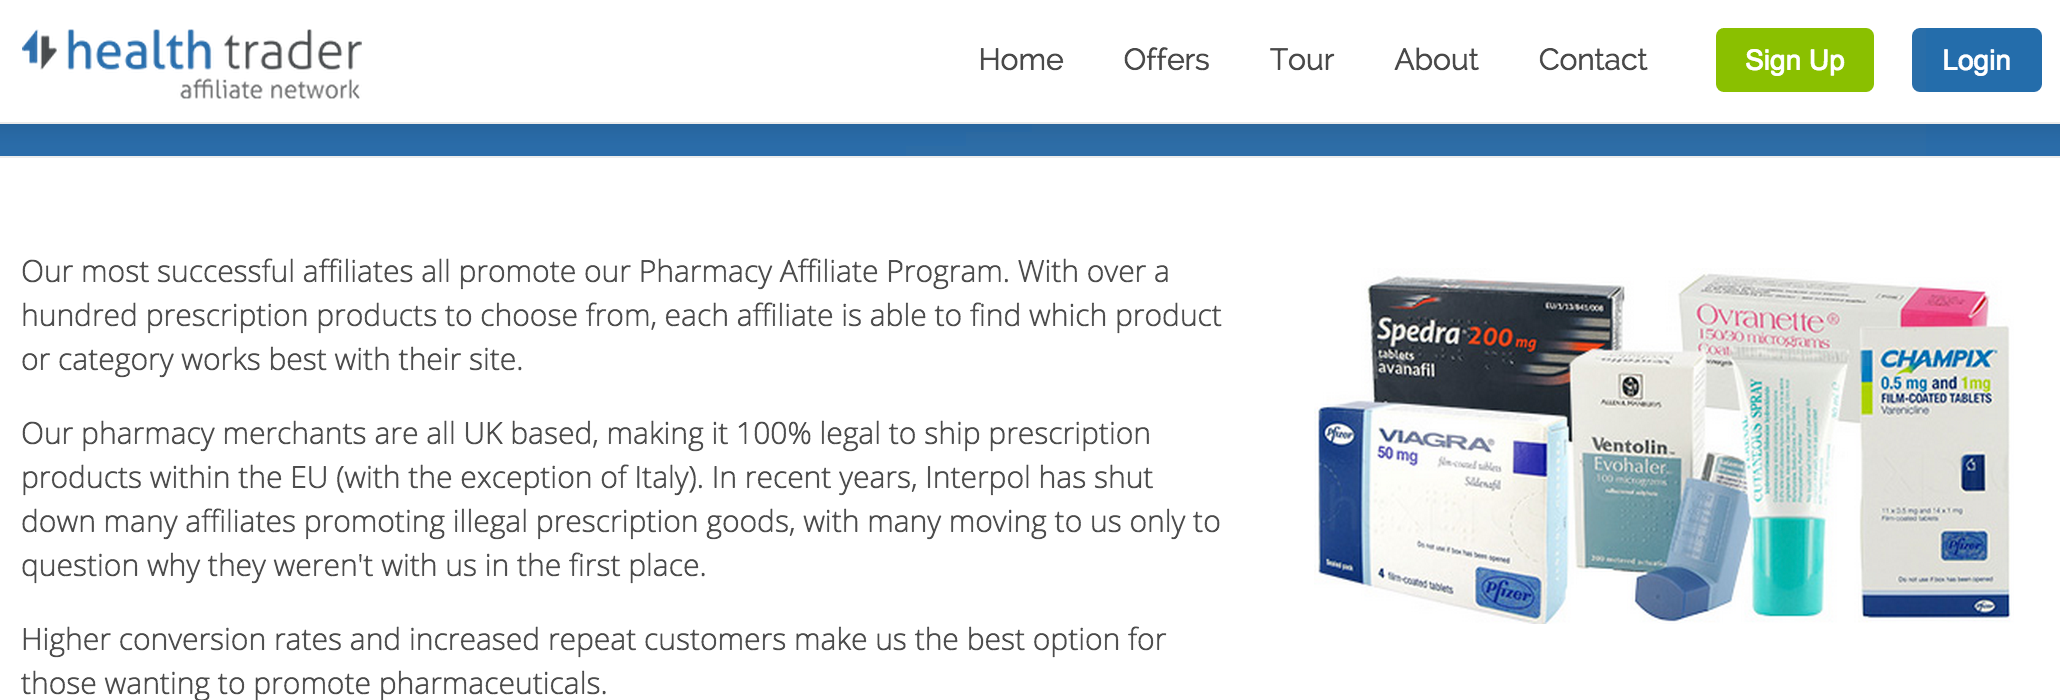 Health Trader - Pharmacy Affiliate Programs